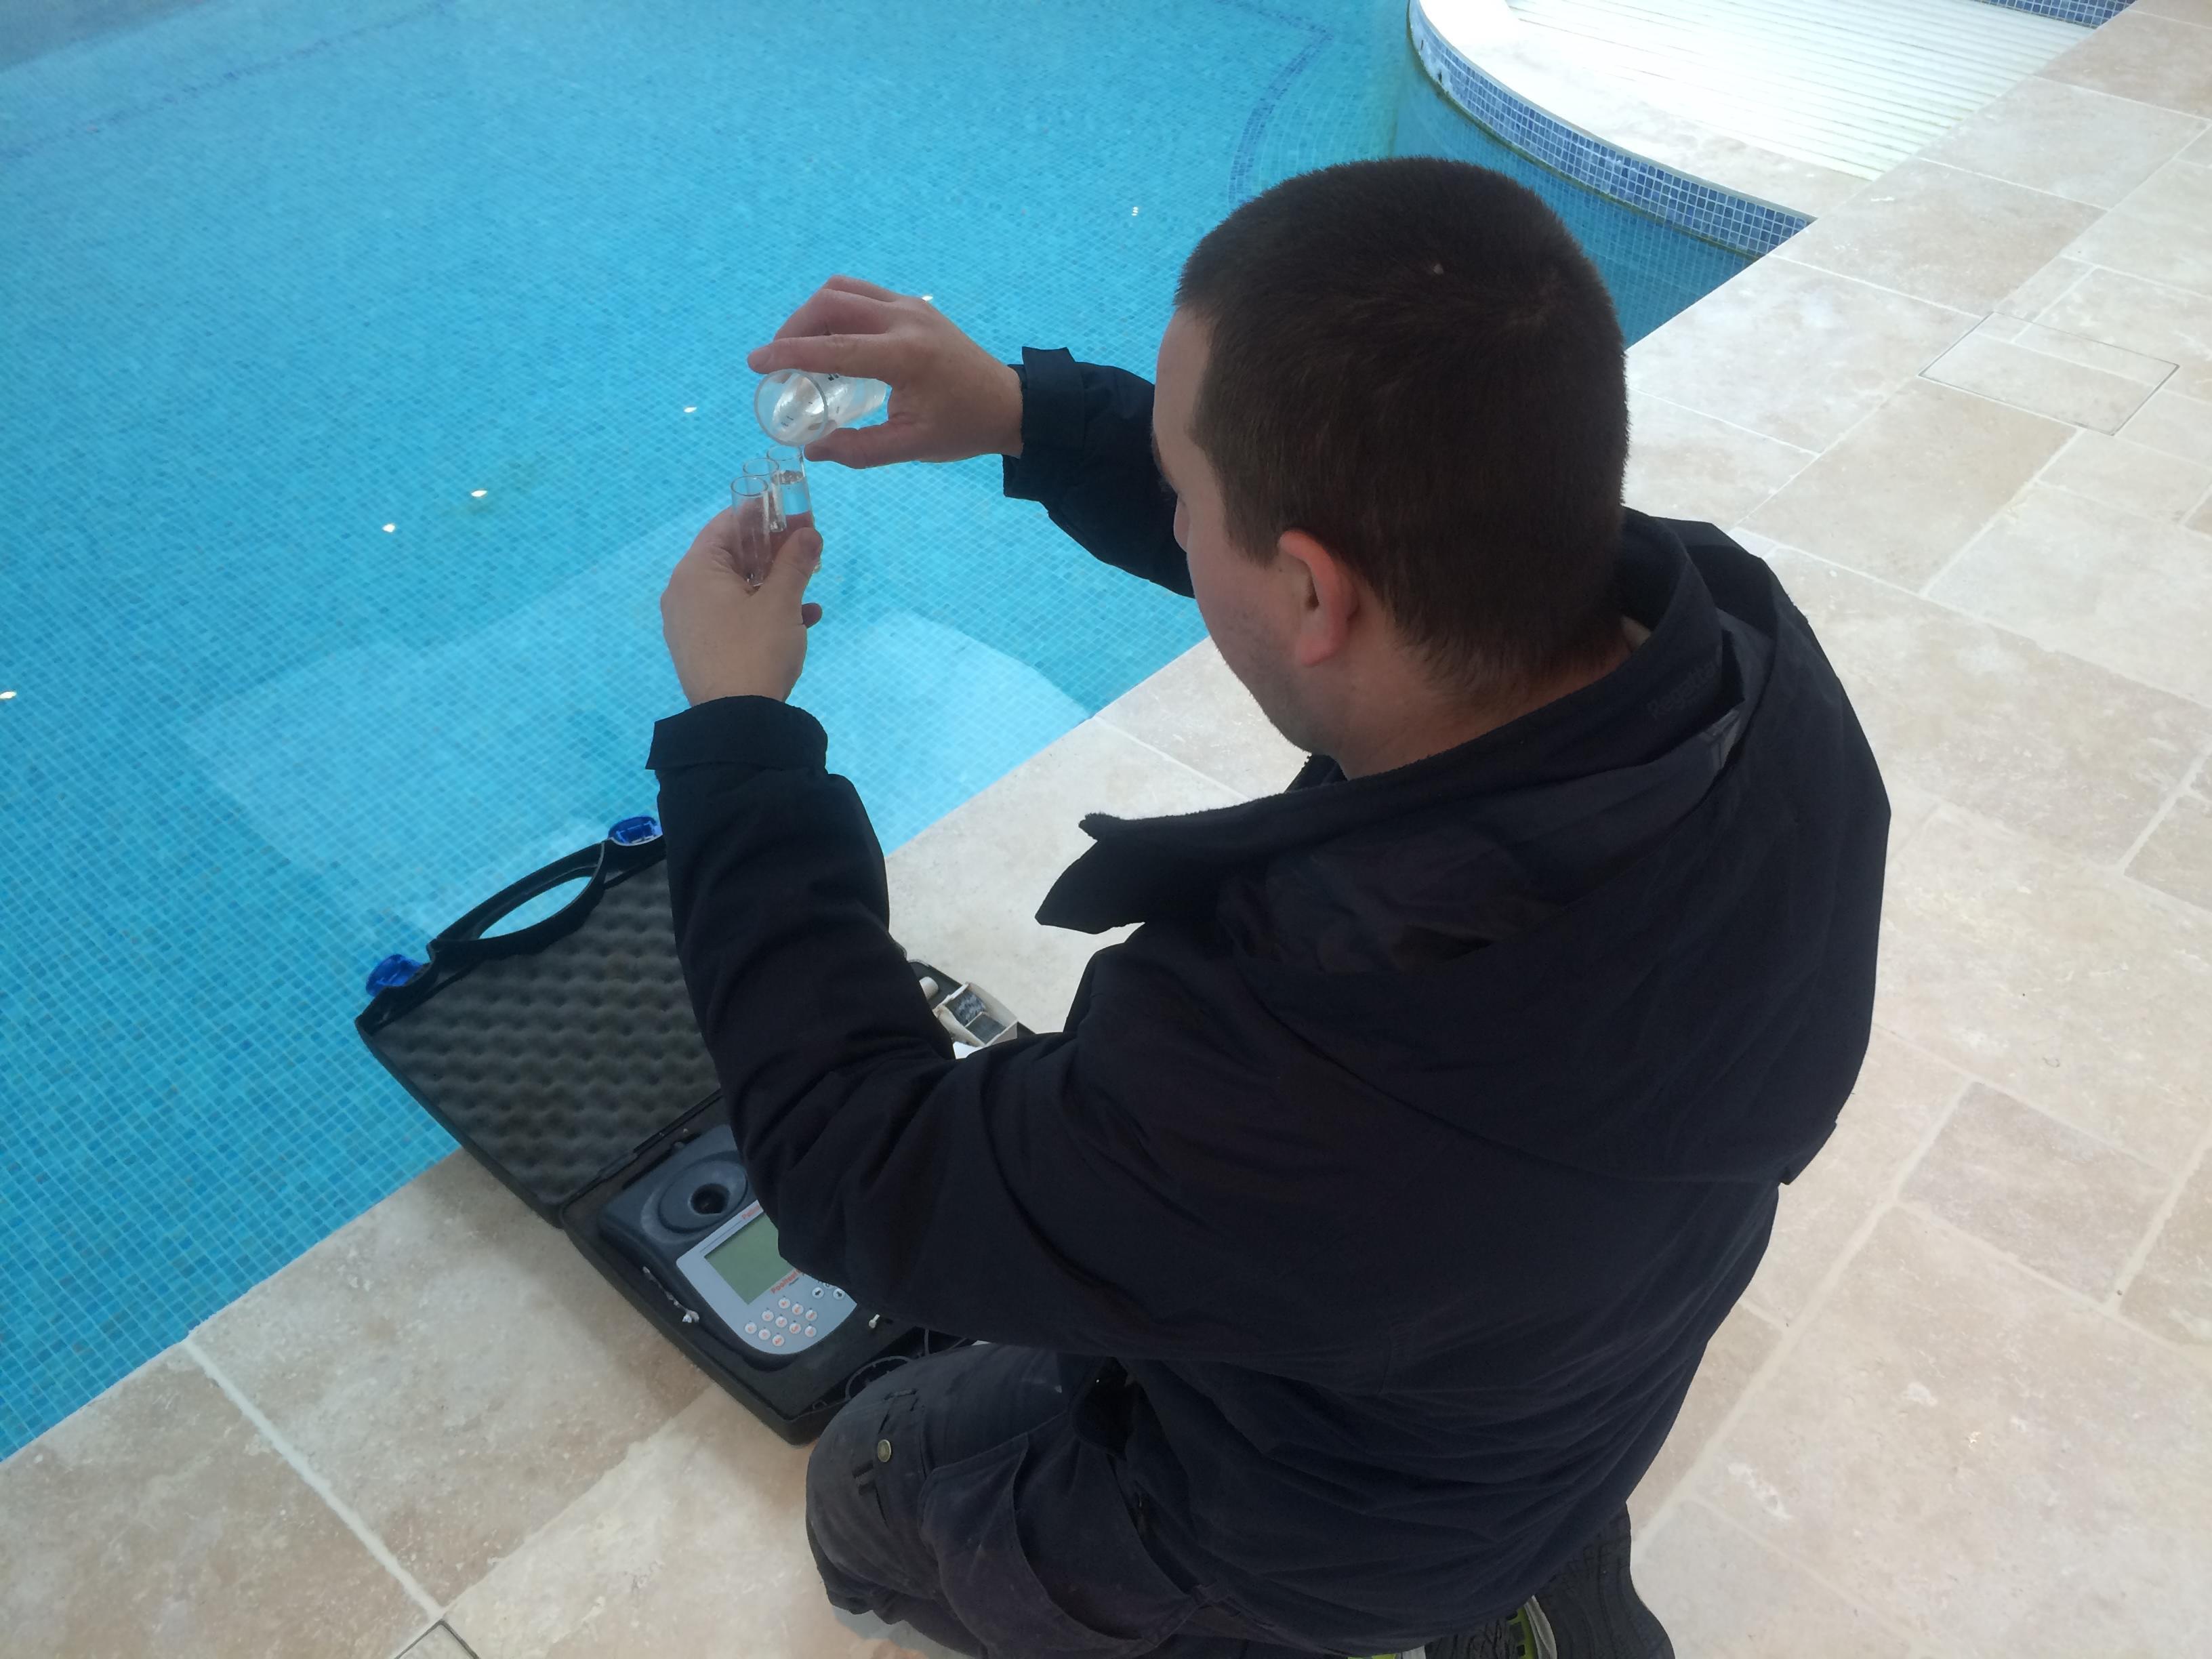 LSPC Servicing Engineer testing pool water chemistry 2016_3